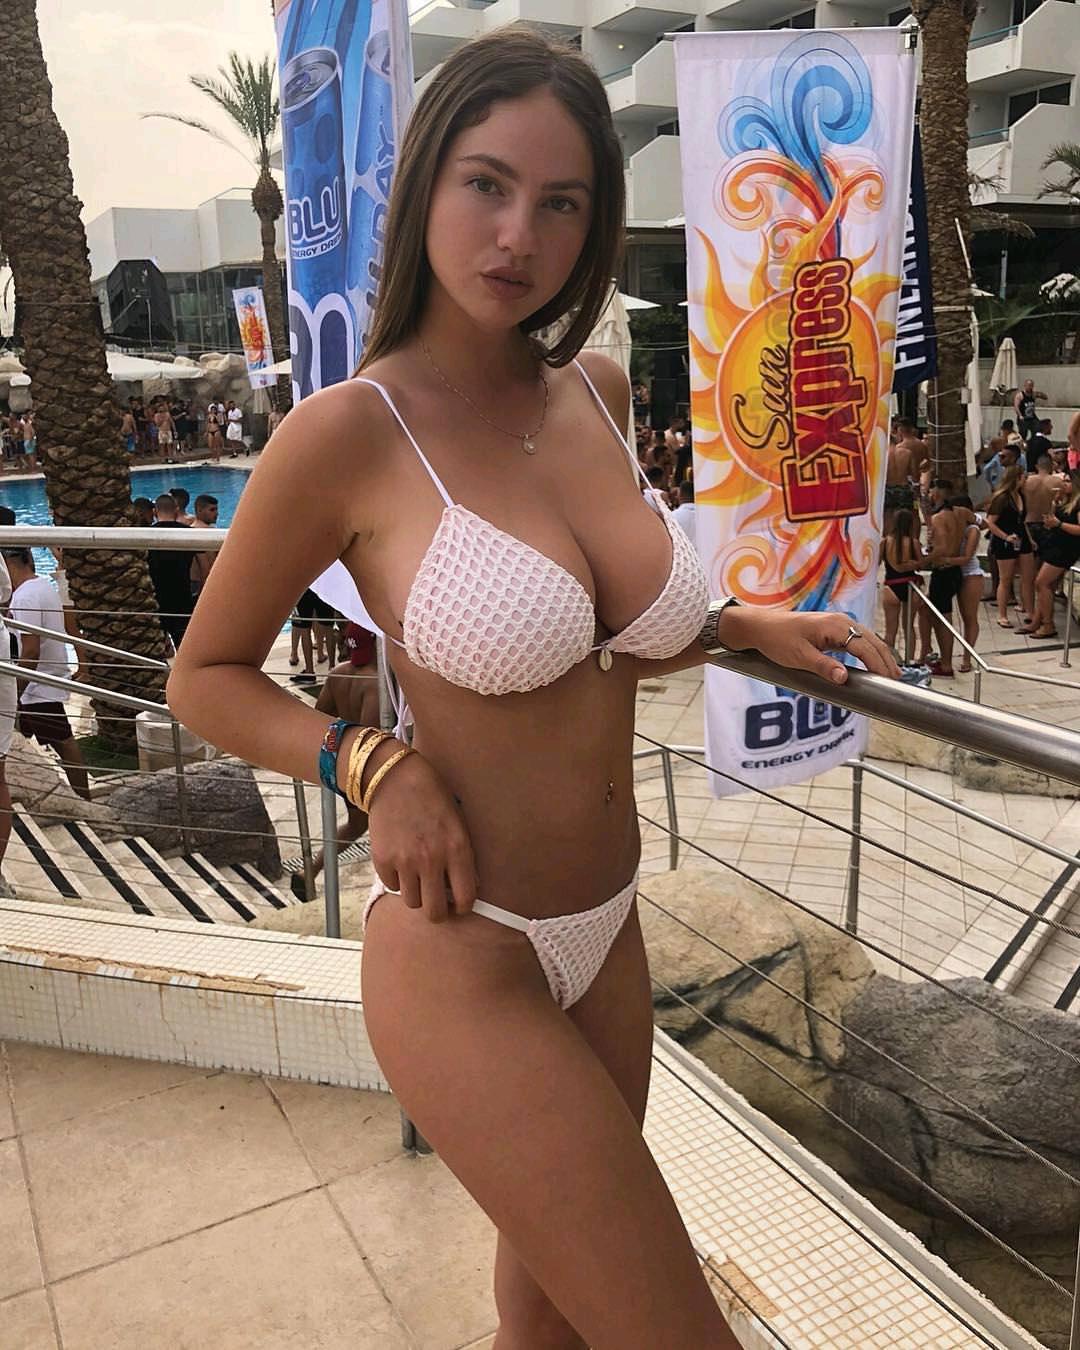 Amy Brenneman Nude Pics sapir elgrabli porn pic - eporner